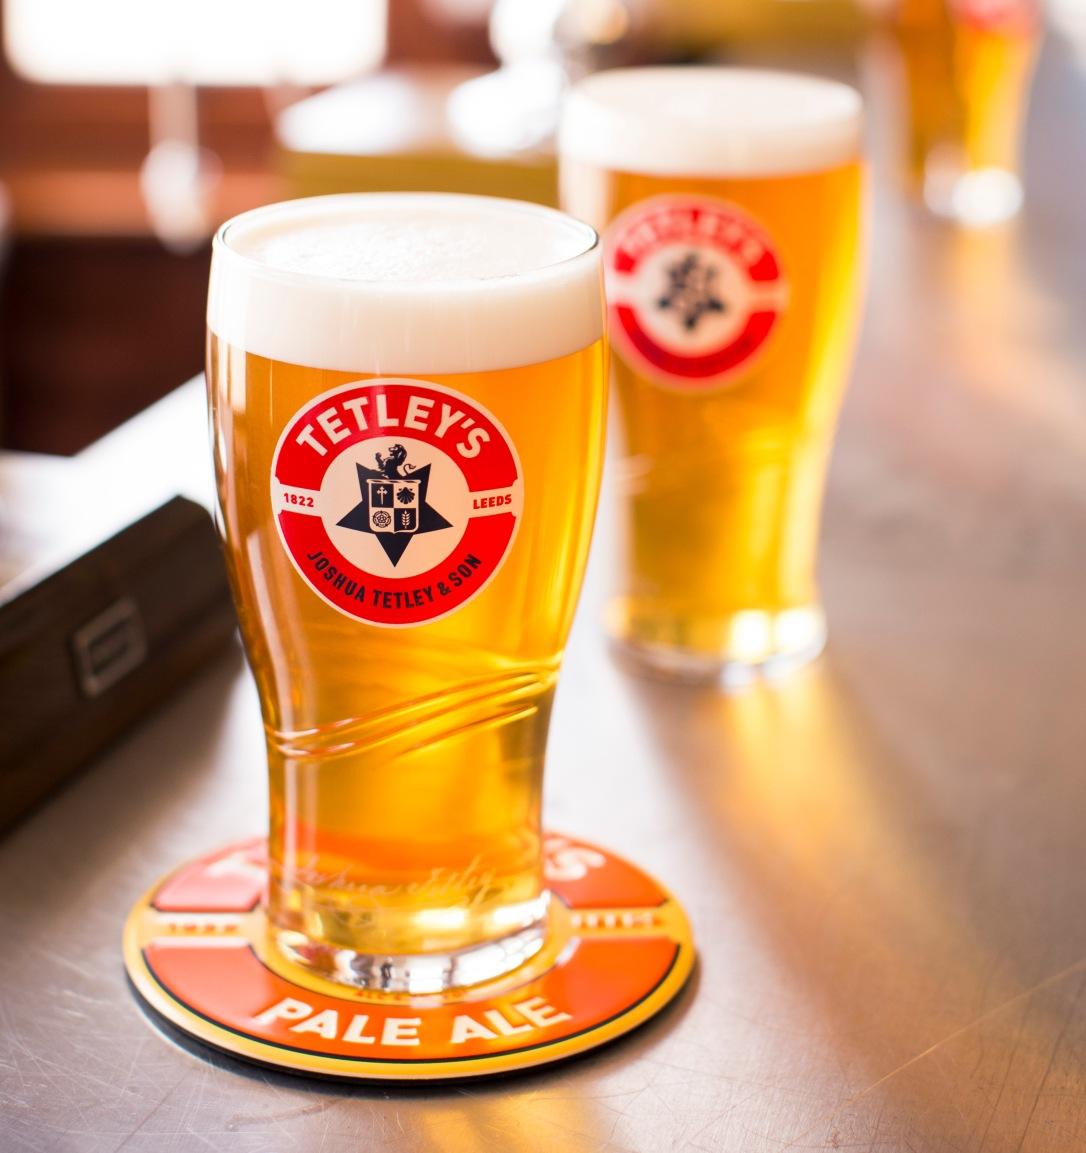 Carlsberg Pale Ale launch